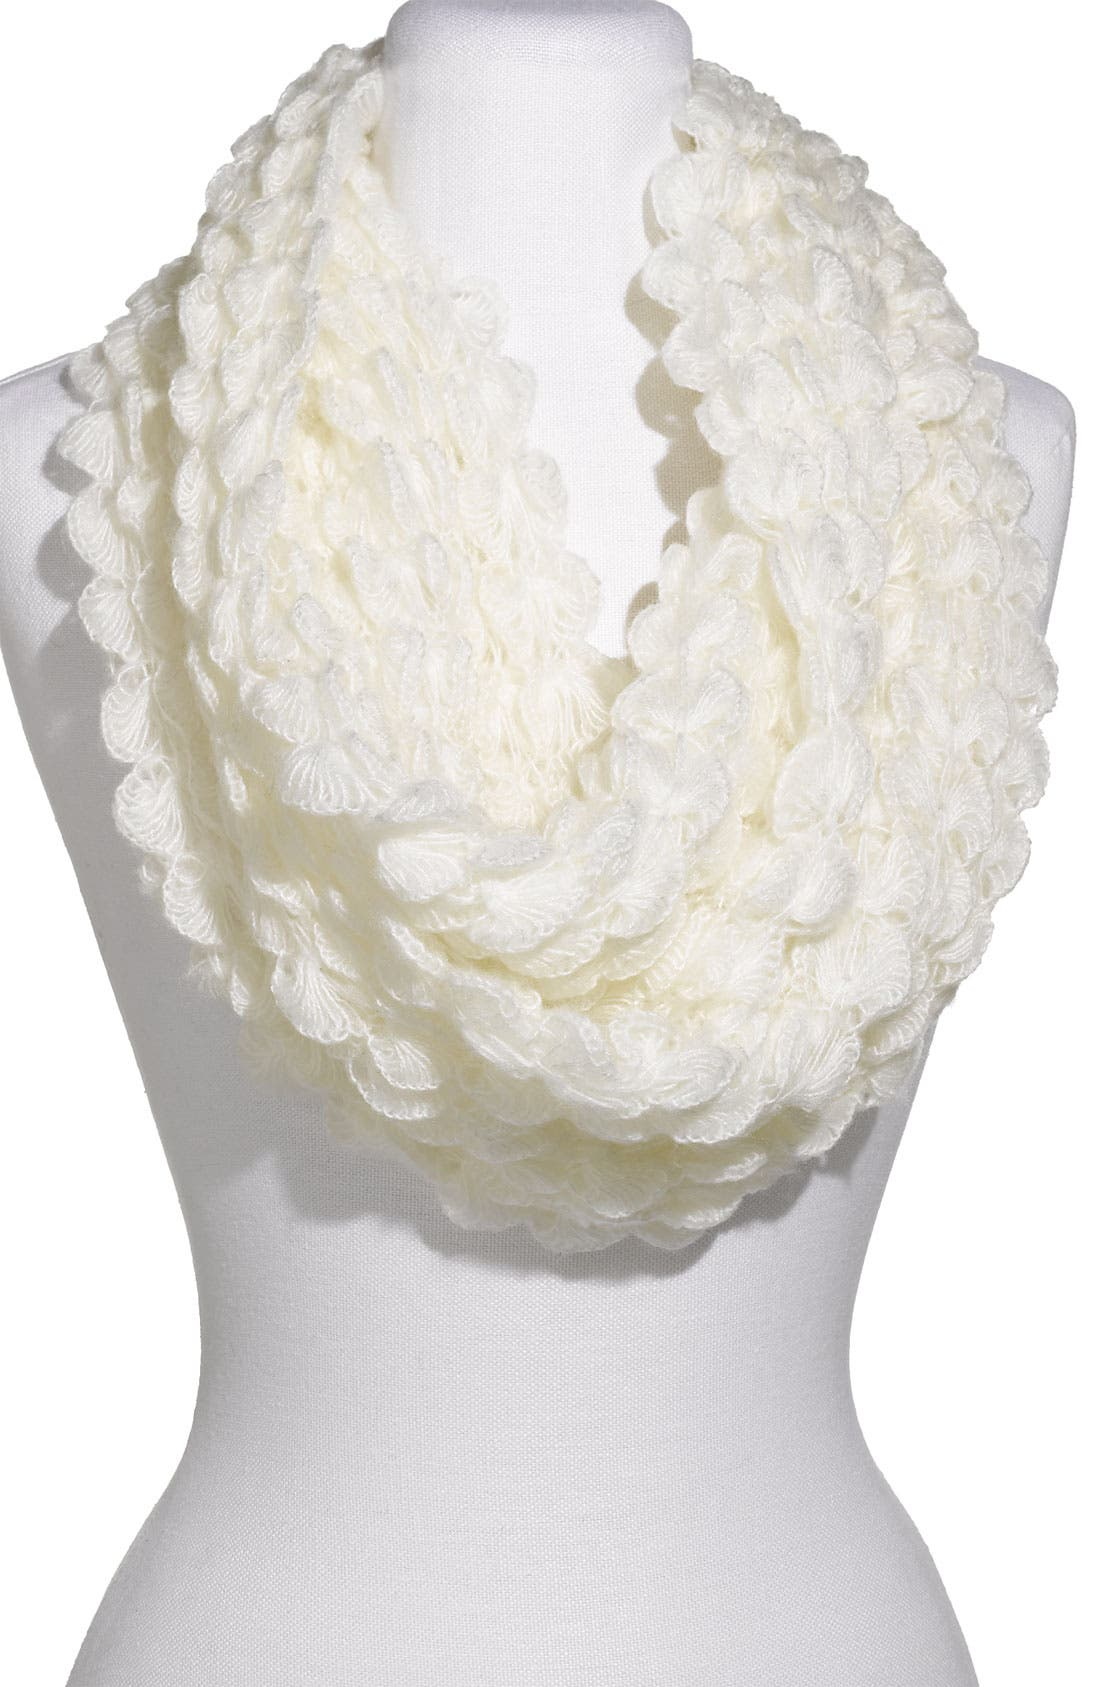 Main Image - Frenchi® Scallop Knit Infinity Scarf